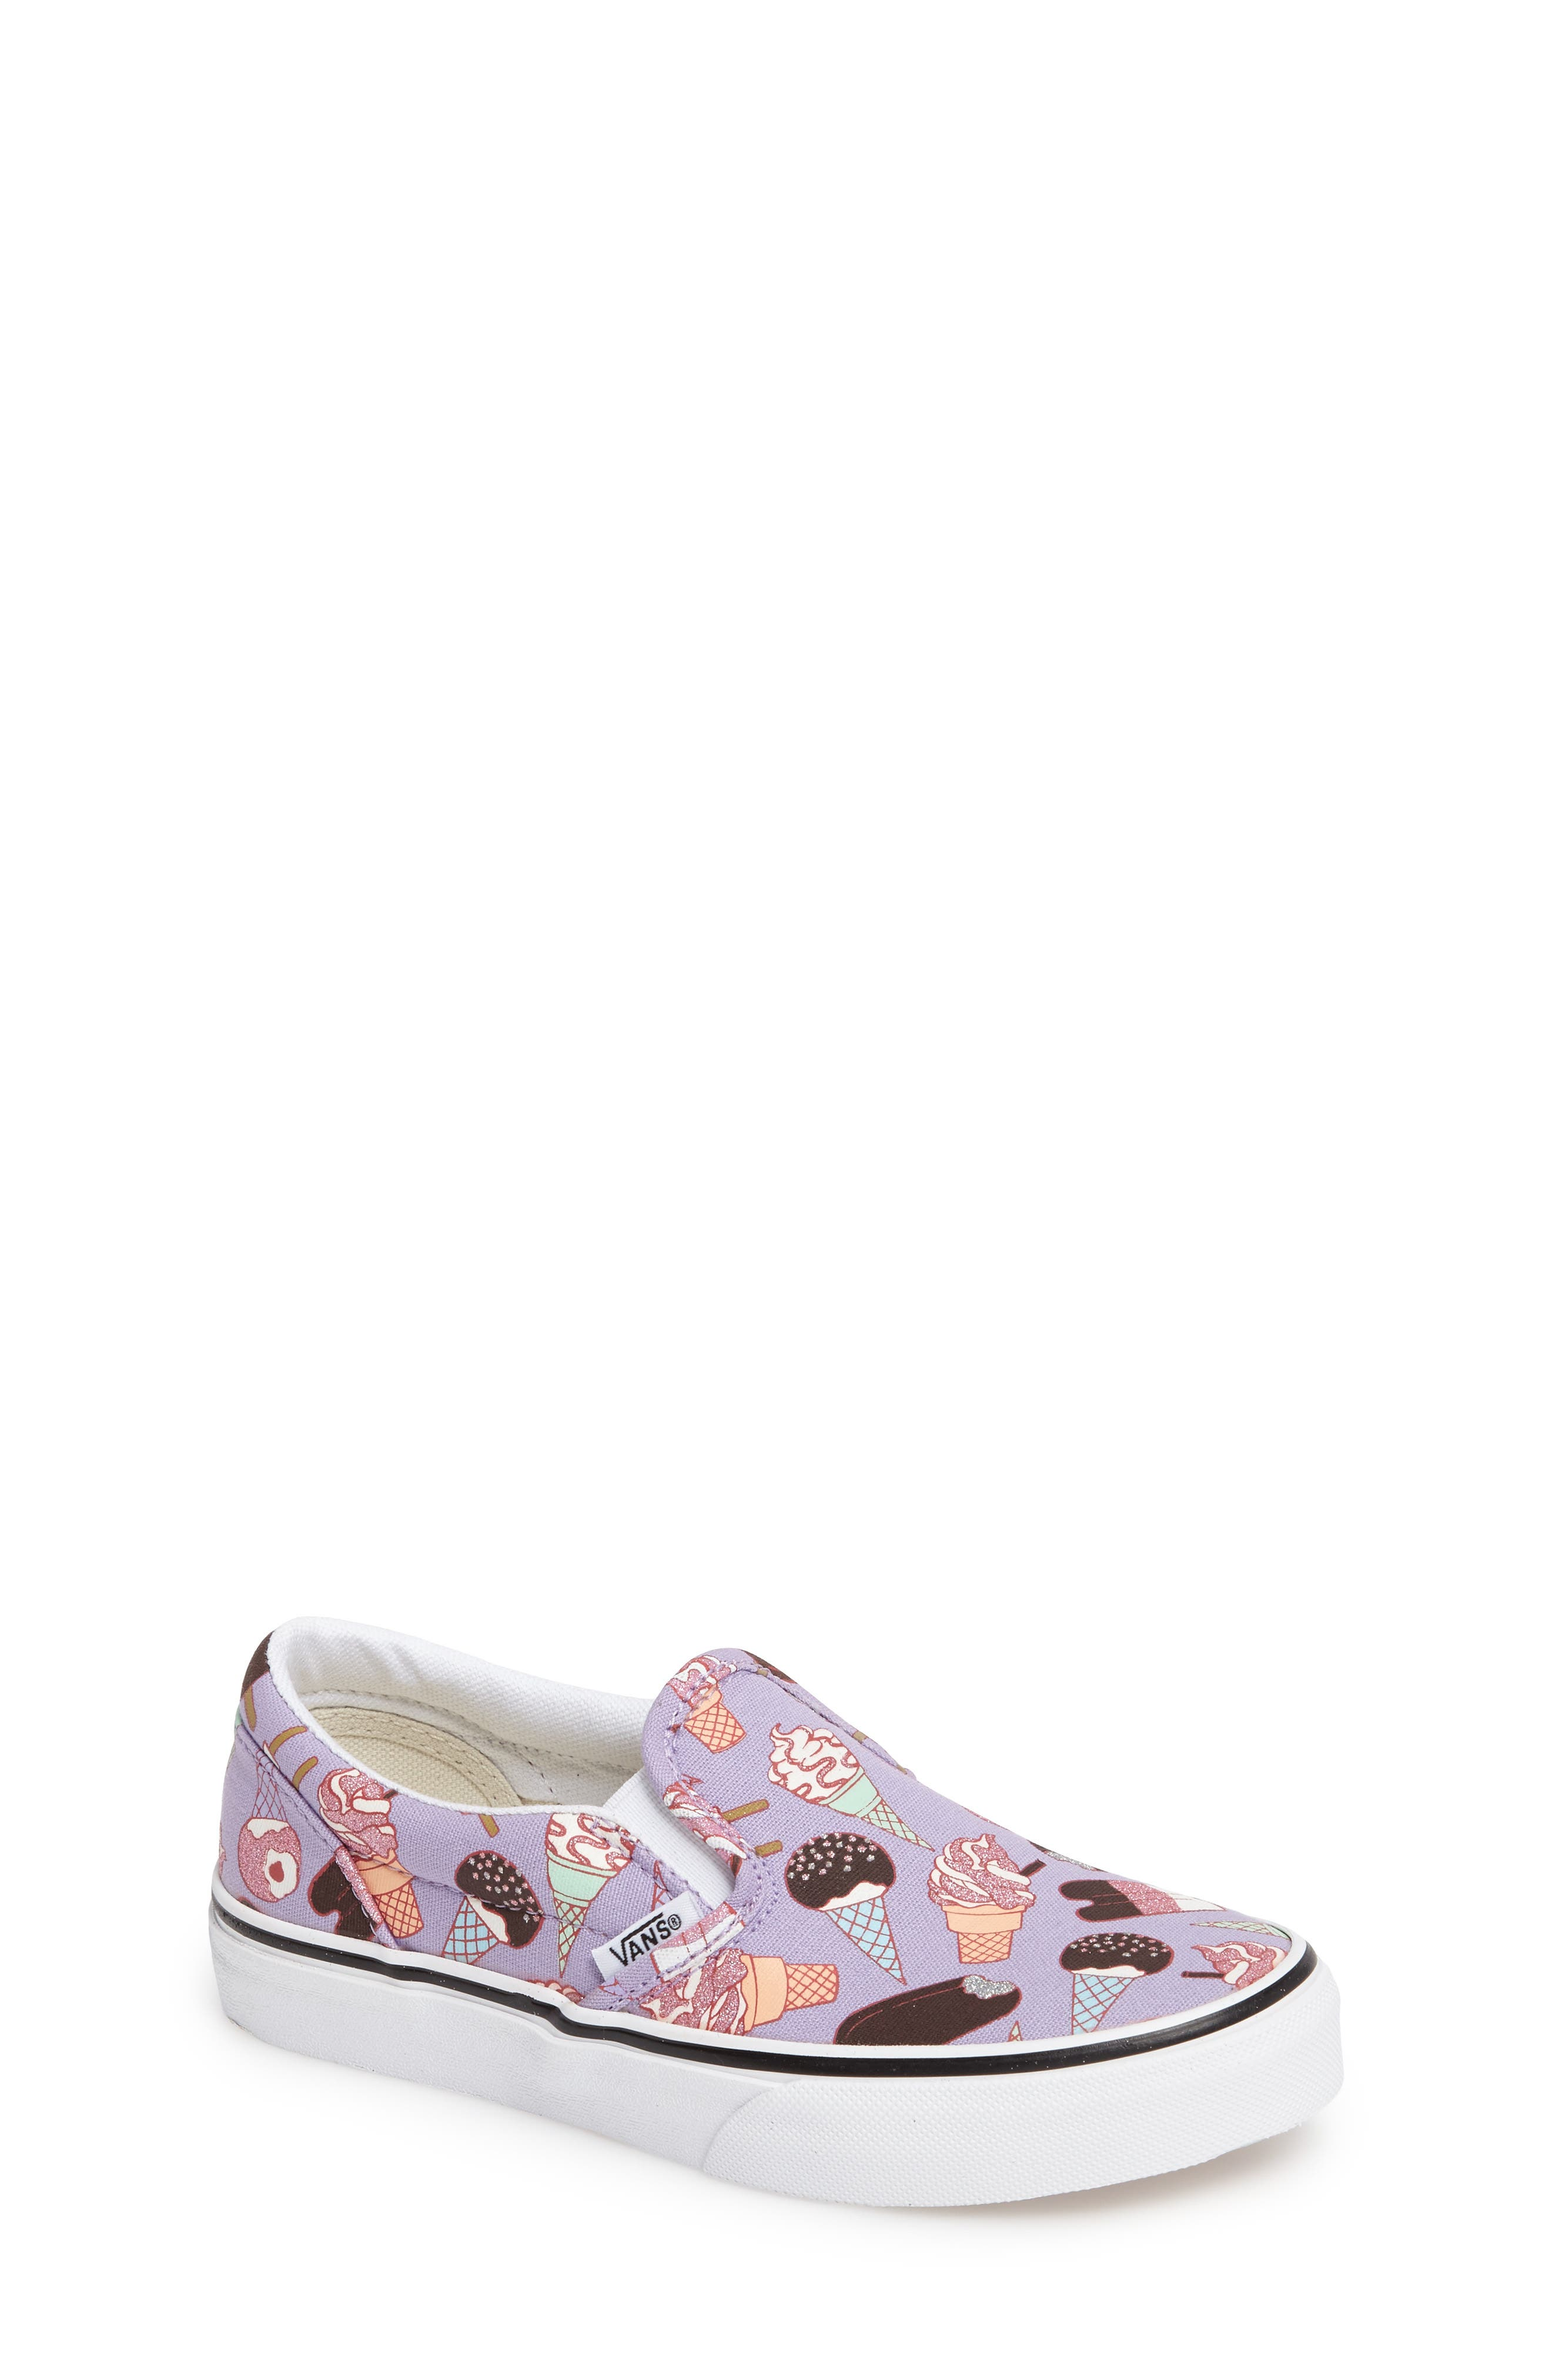 Classic Slip-On,                             Main thumbnail 1, color,                             Glitter Lavender/ White